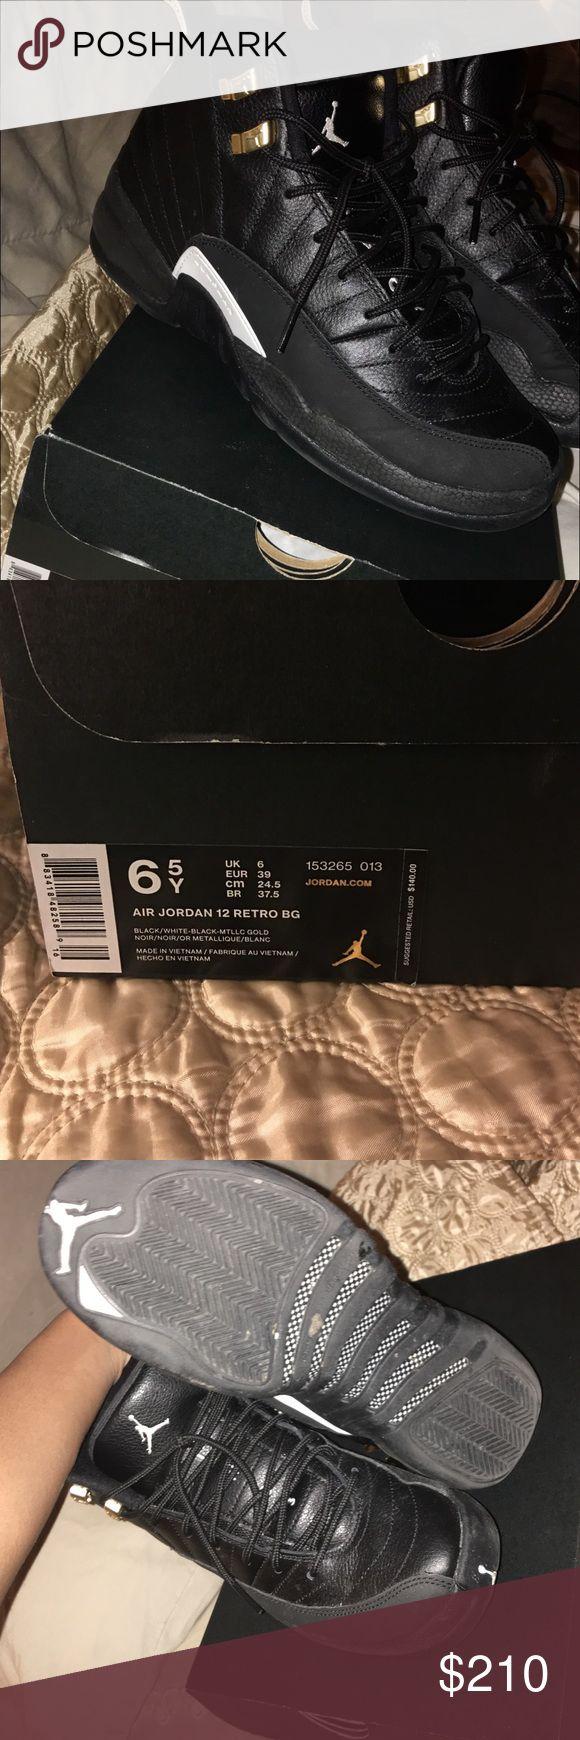 Retro master 12s All black Jordan's, super rare Jordan Shoes Sneakers